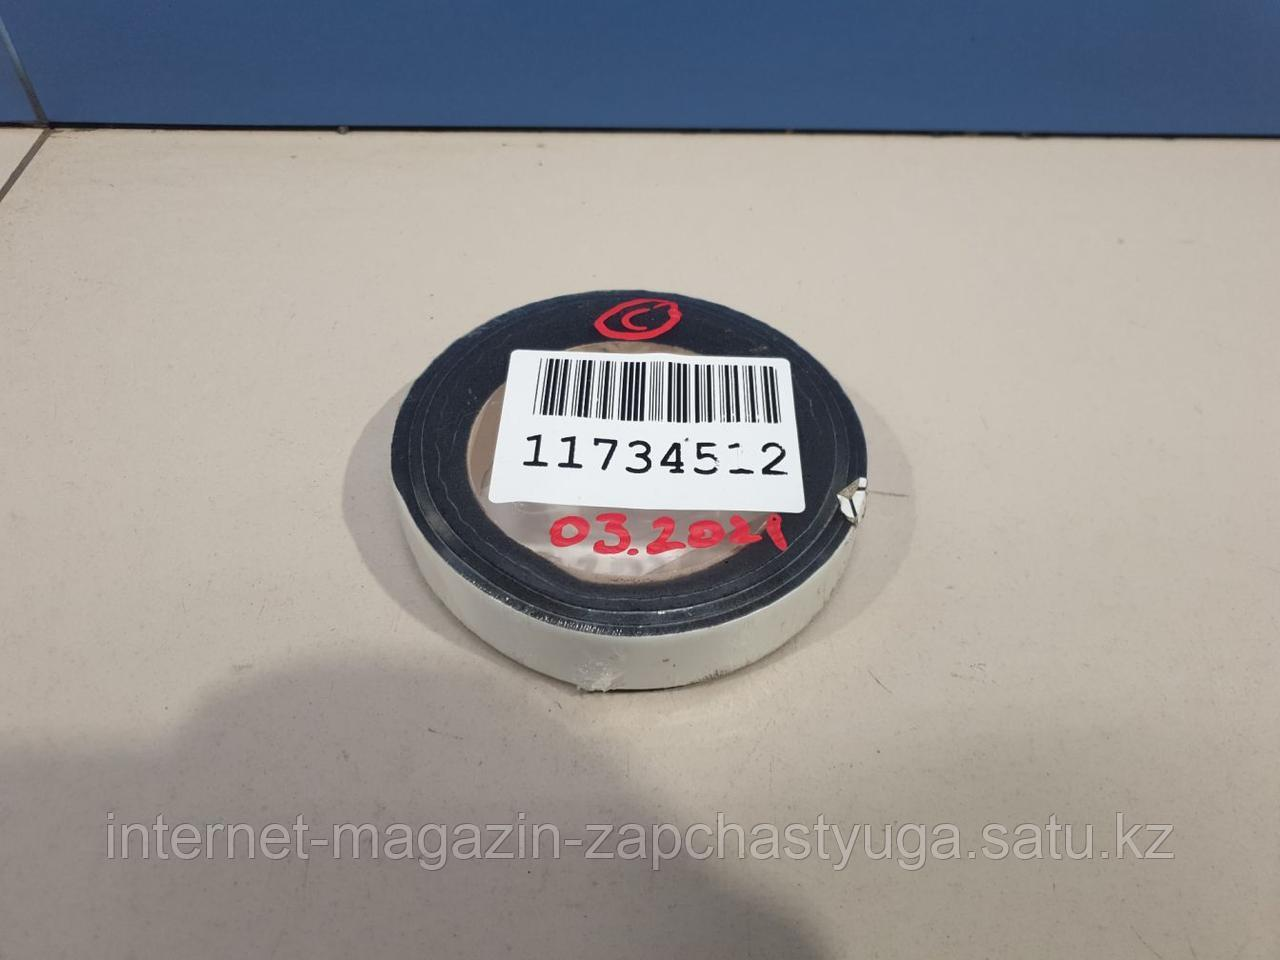 51489143684 Уплотнитель передней панели кузова для BMW X3 F25 2010-2017 Б/У - фото 1